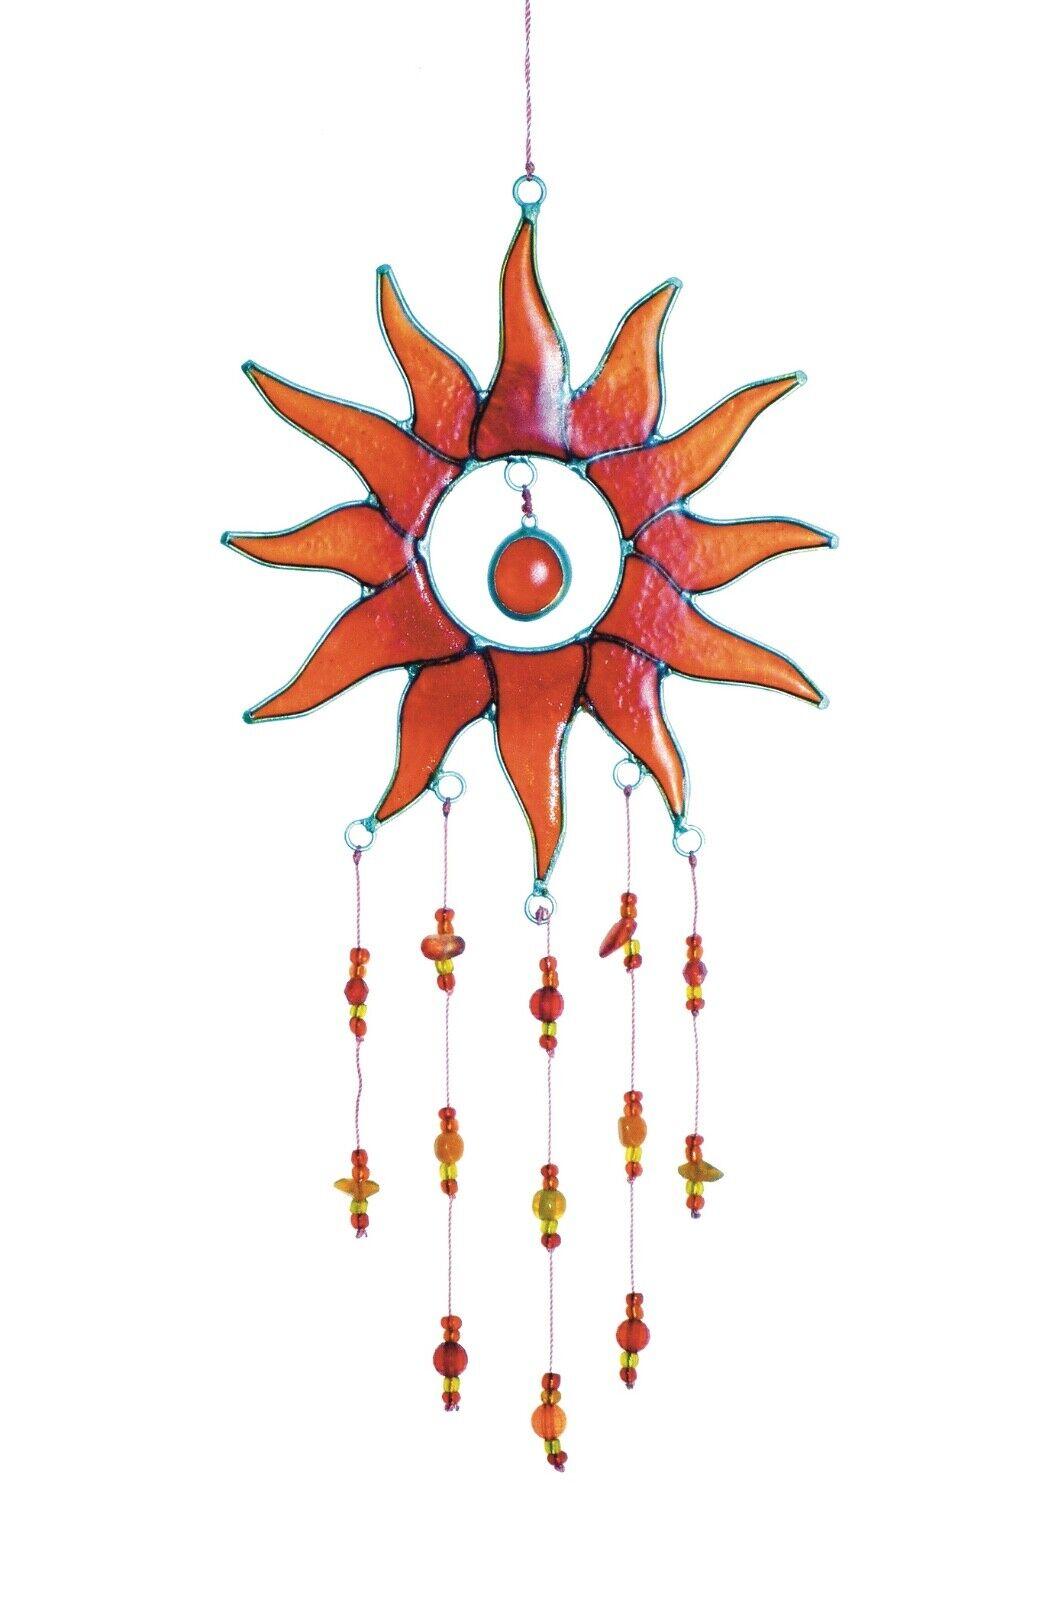 Sun Suncatcher Window Decoration Red and Orange with Beads